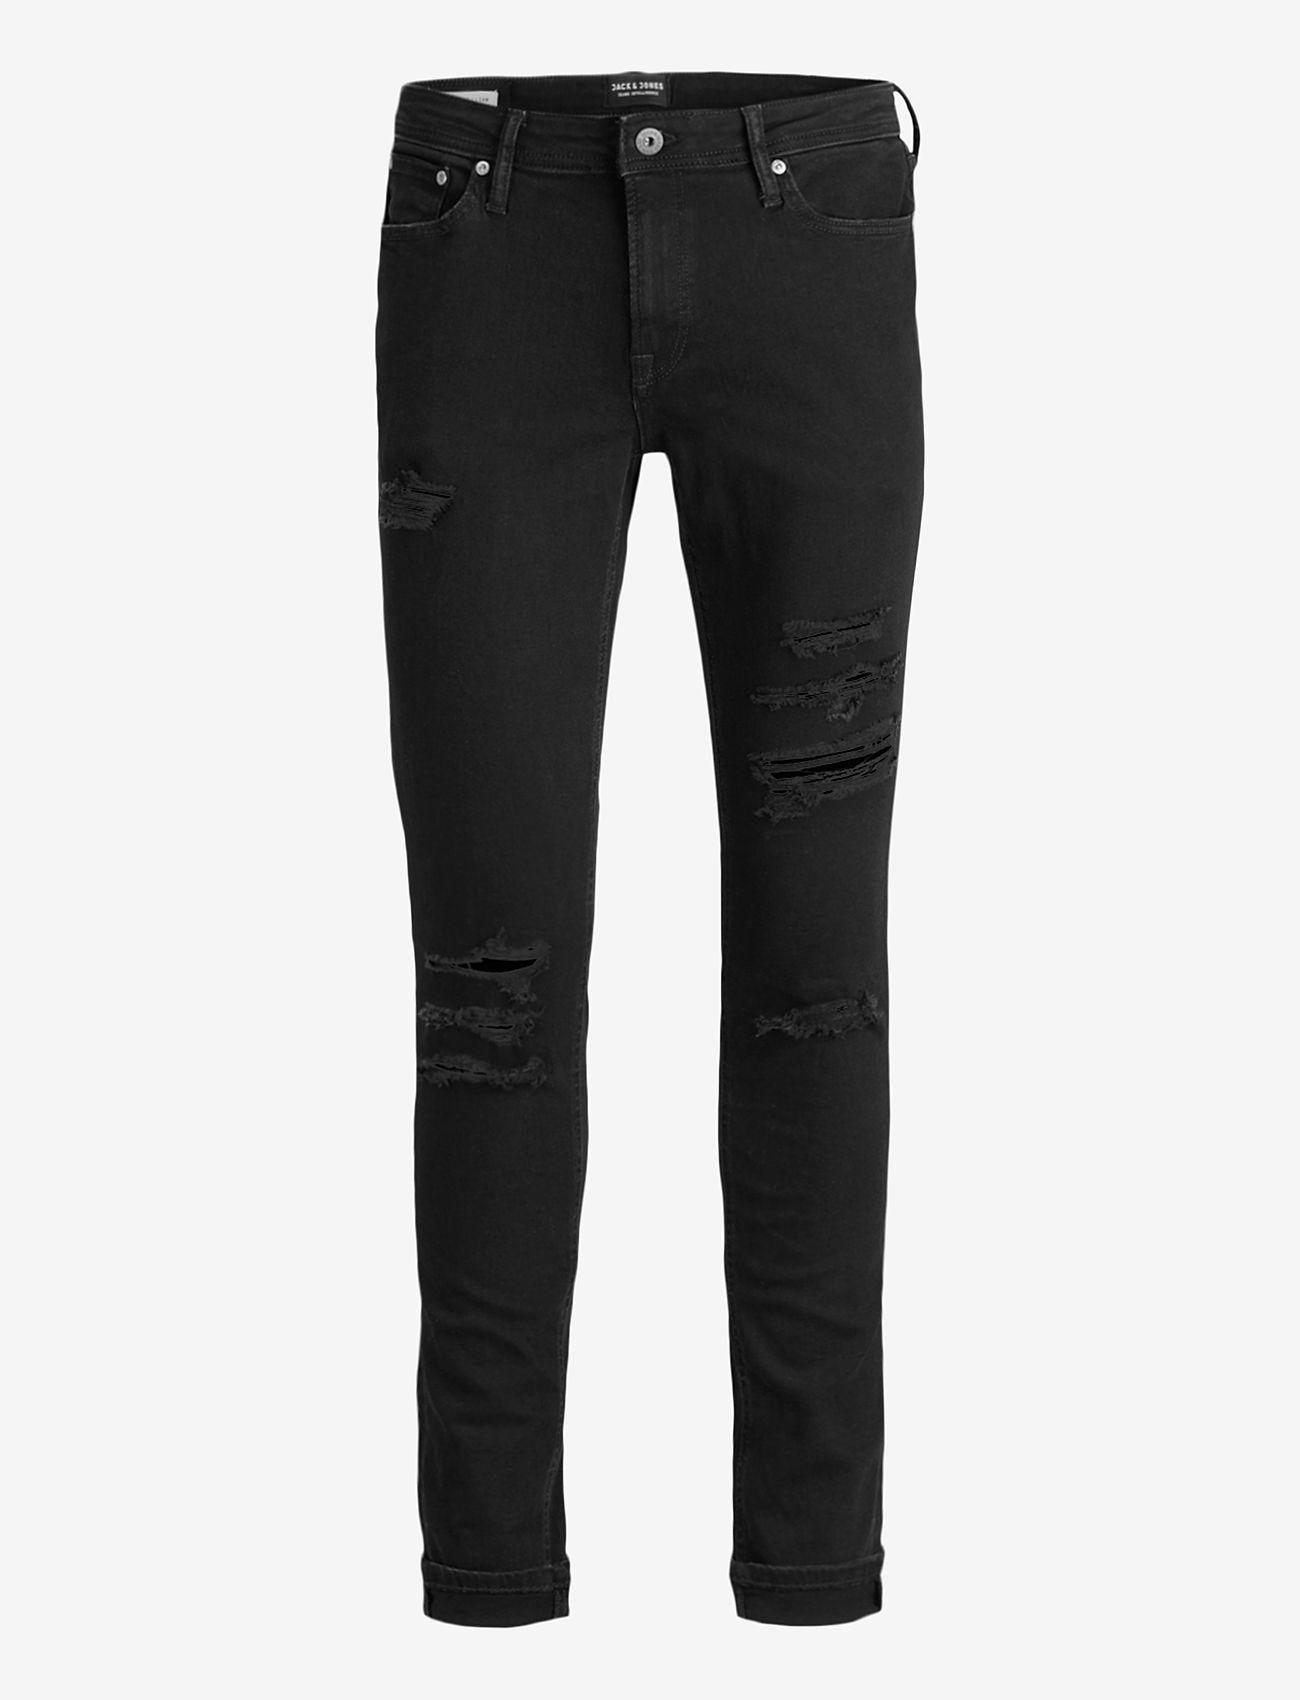 Jack & Jones - JJILIAM JJORIGINAL AM 502 50 SPS NOOS - skinny jeans - black denim - 0